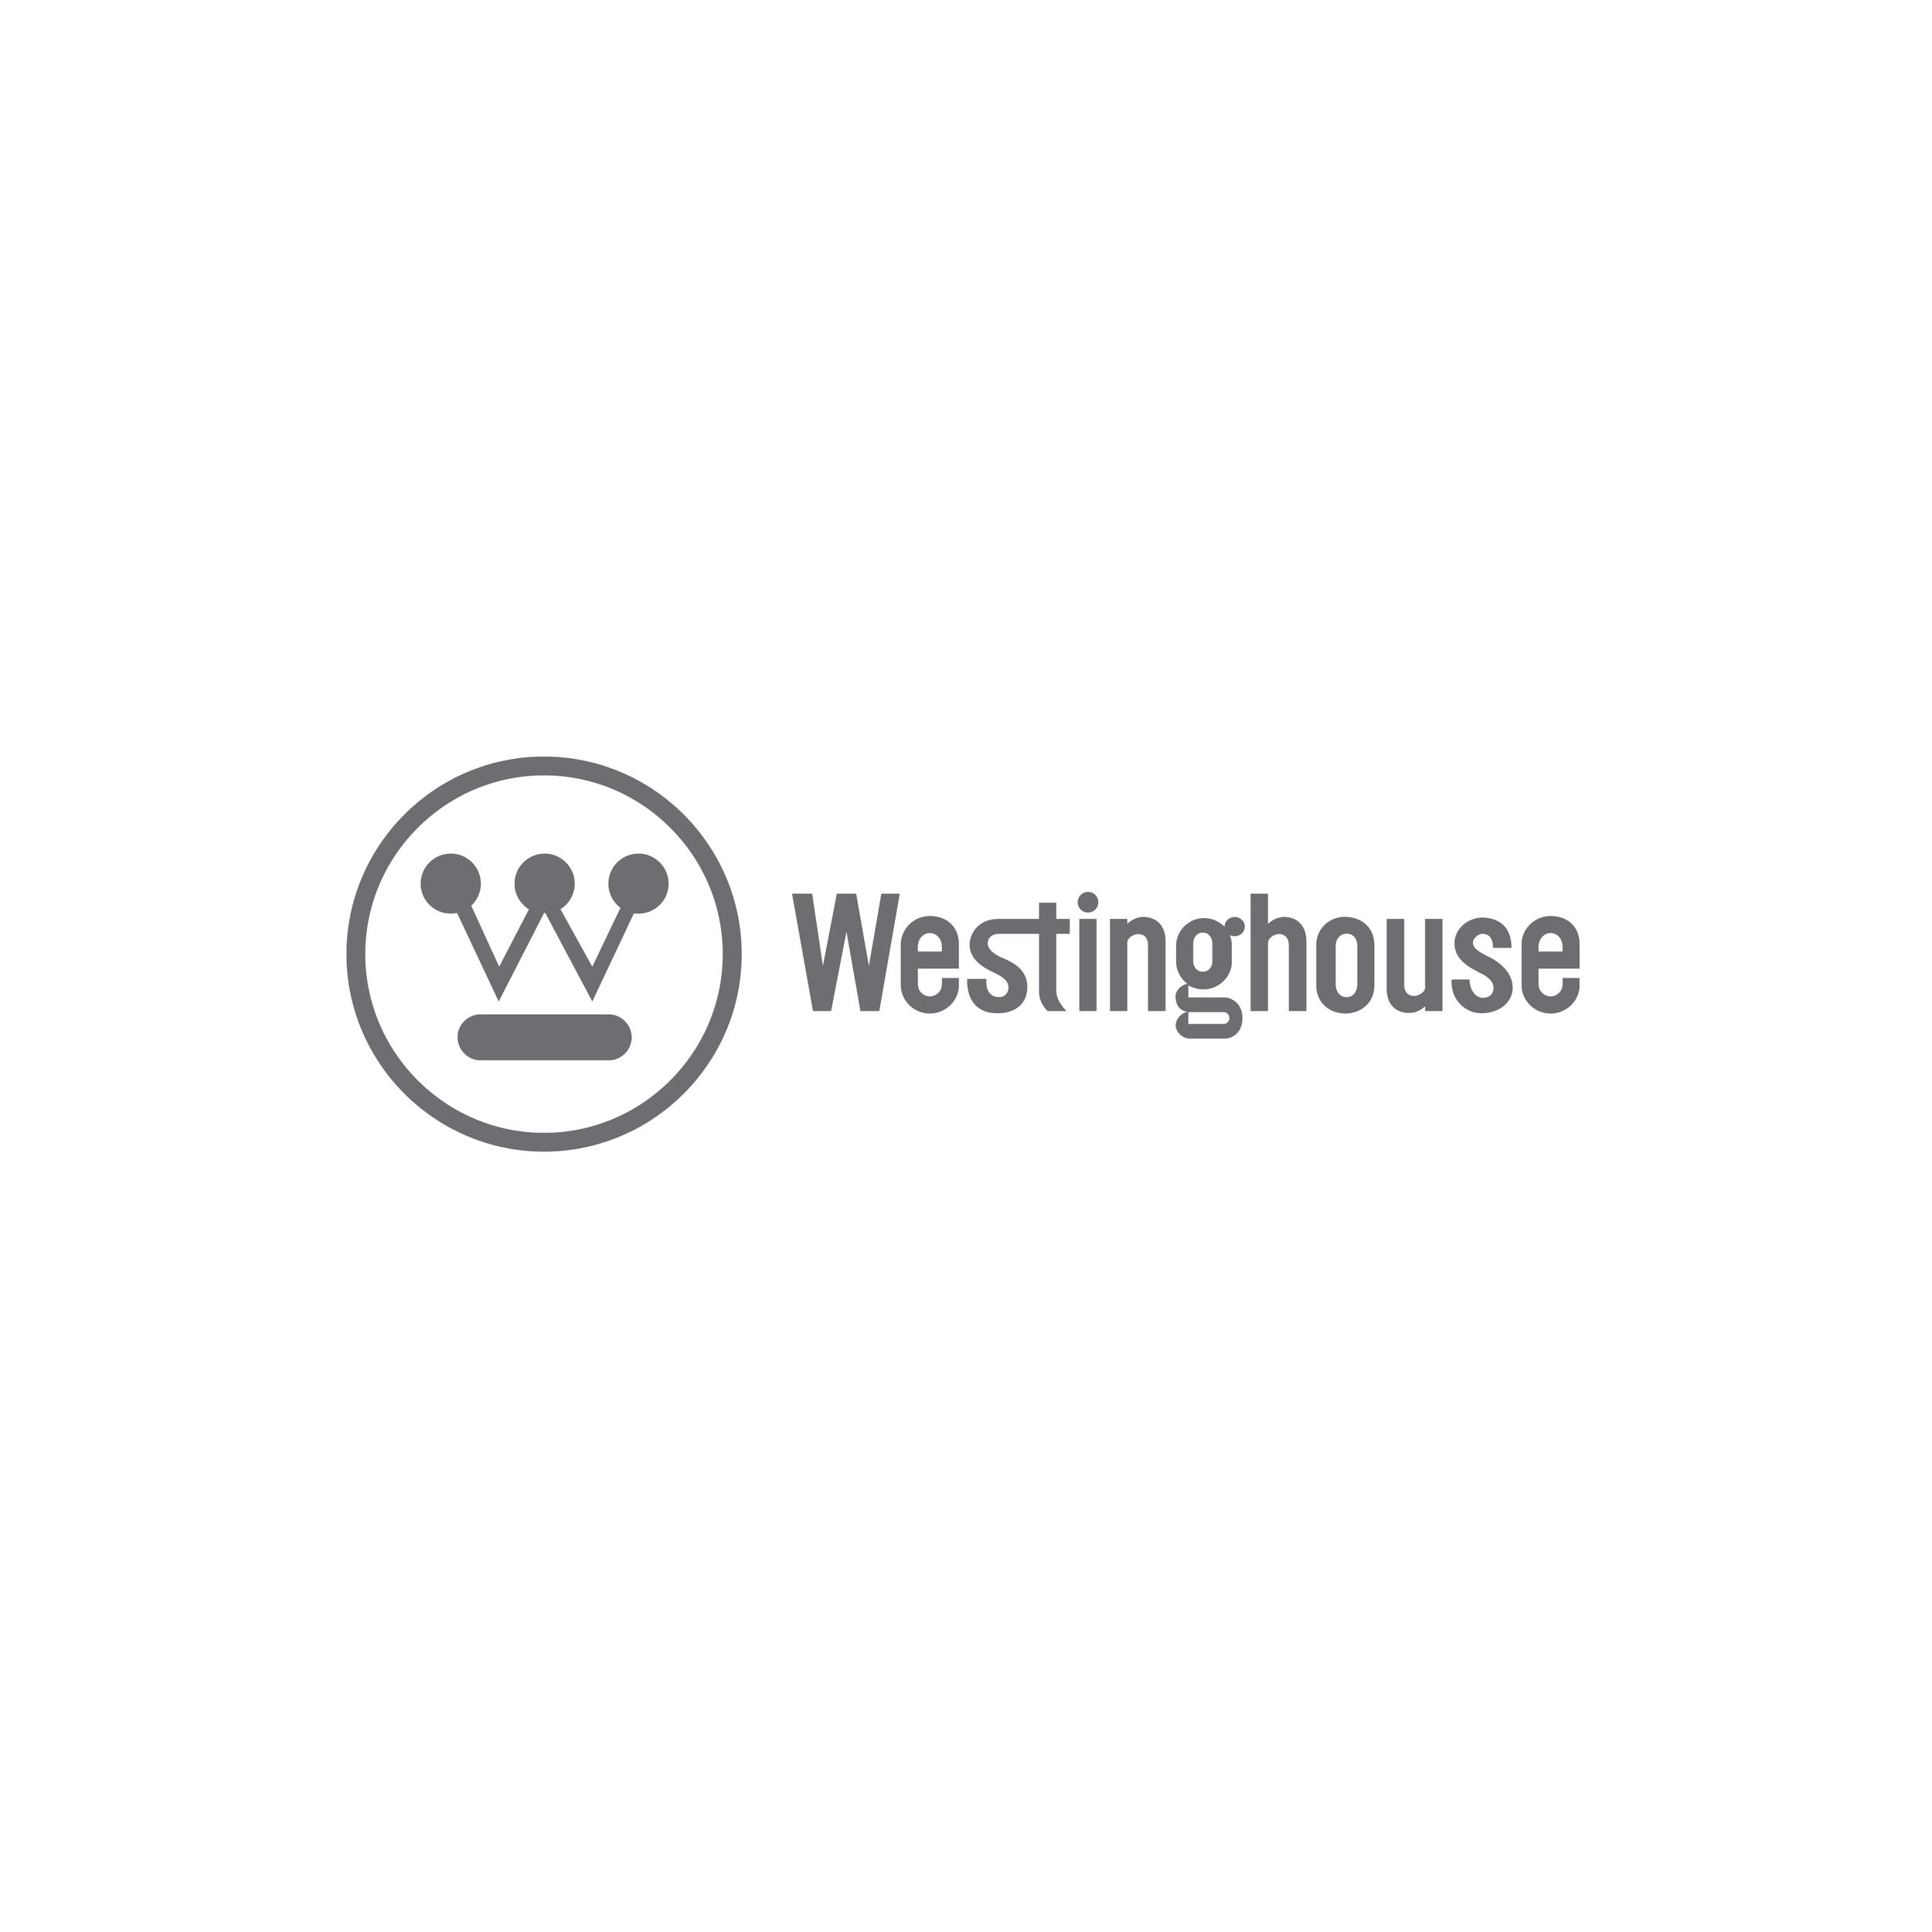 Logo-29-Westinghouse.jpg